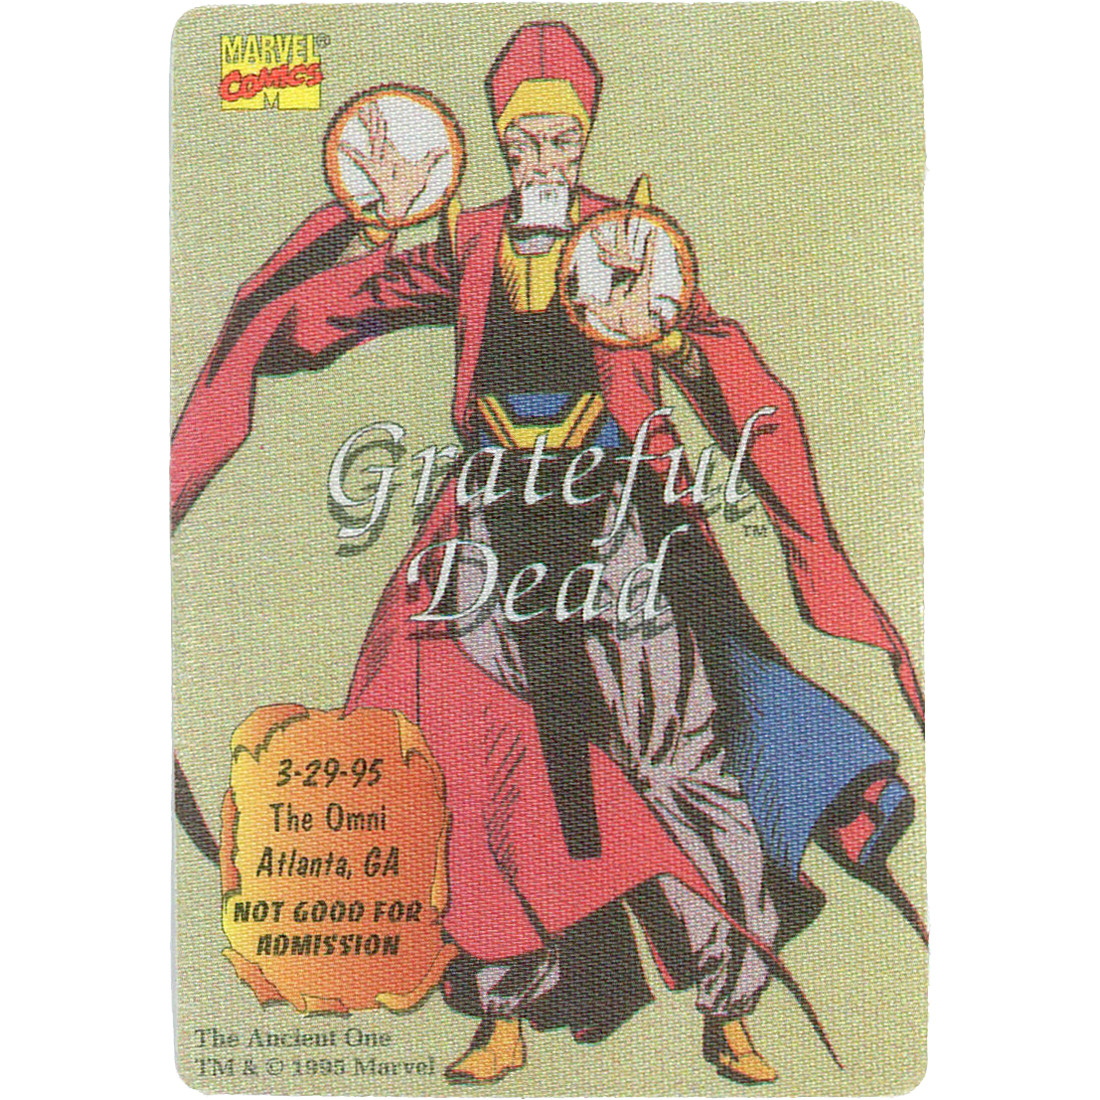 Grateful Dead 1995 03-29 Backstage Pass